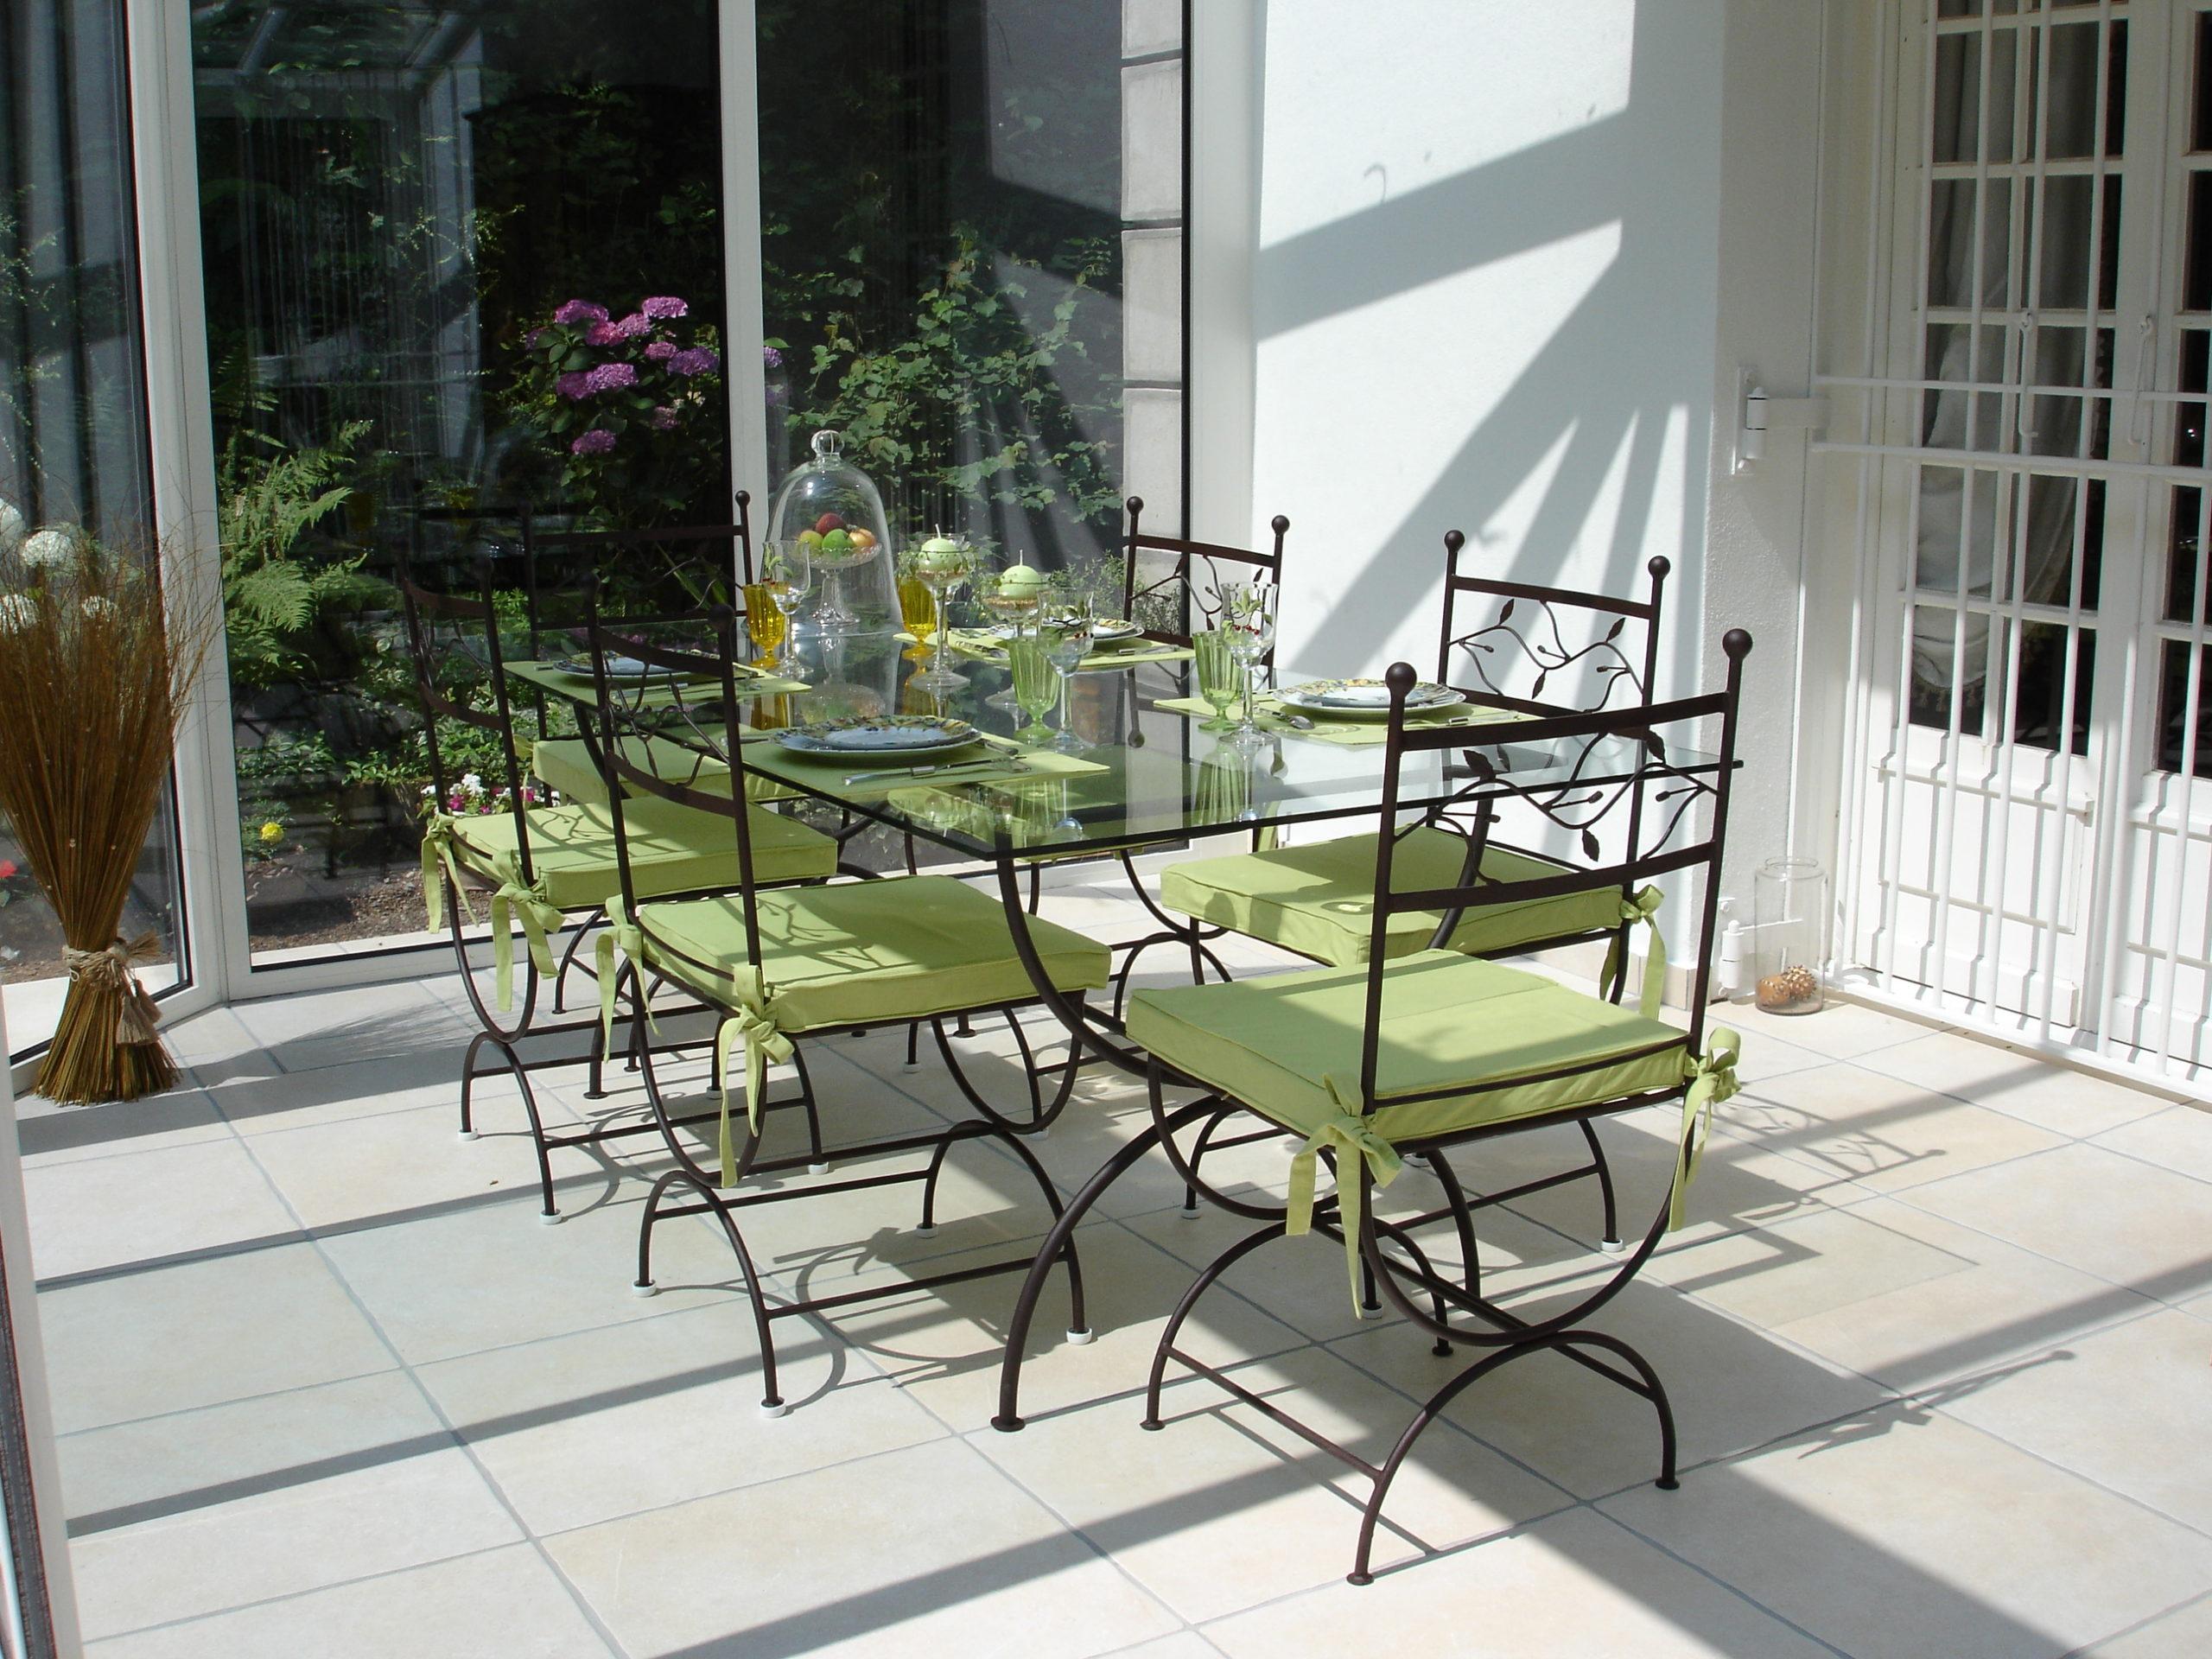 vervas-metal-mobilier-table-10